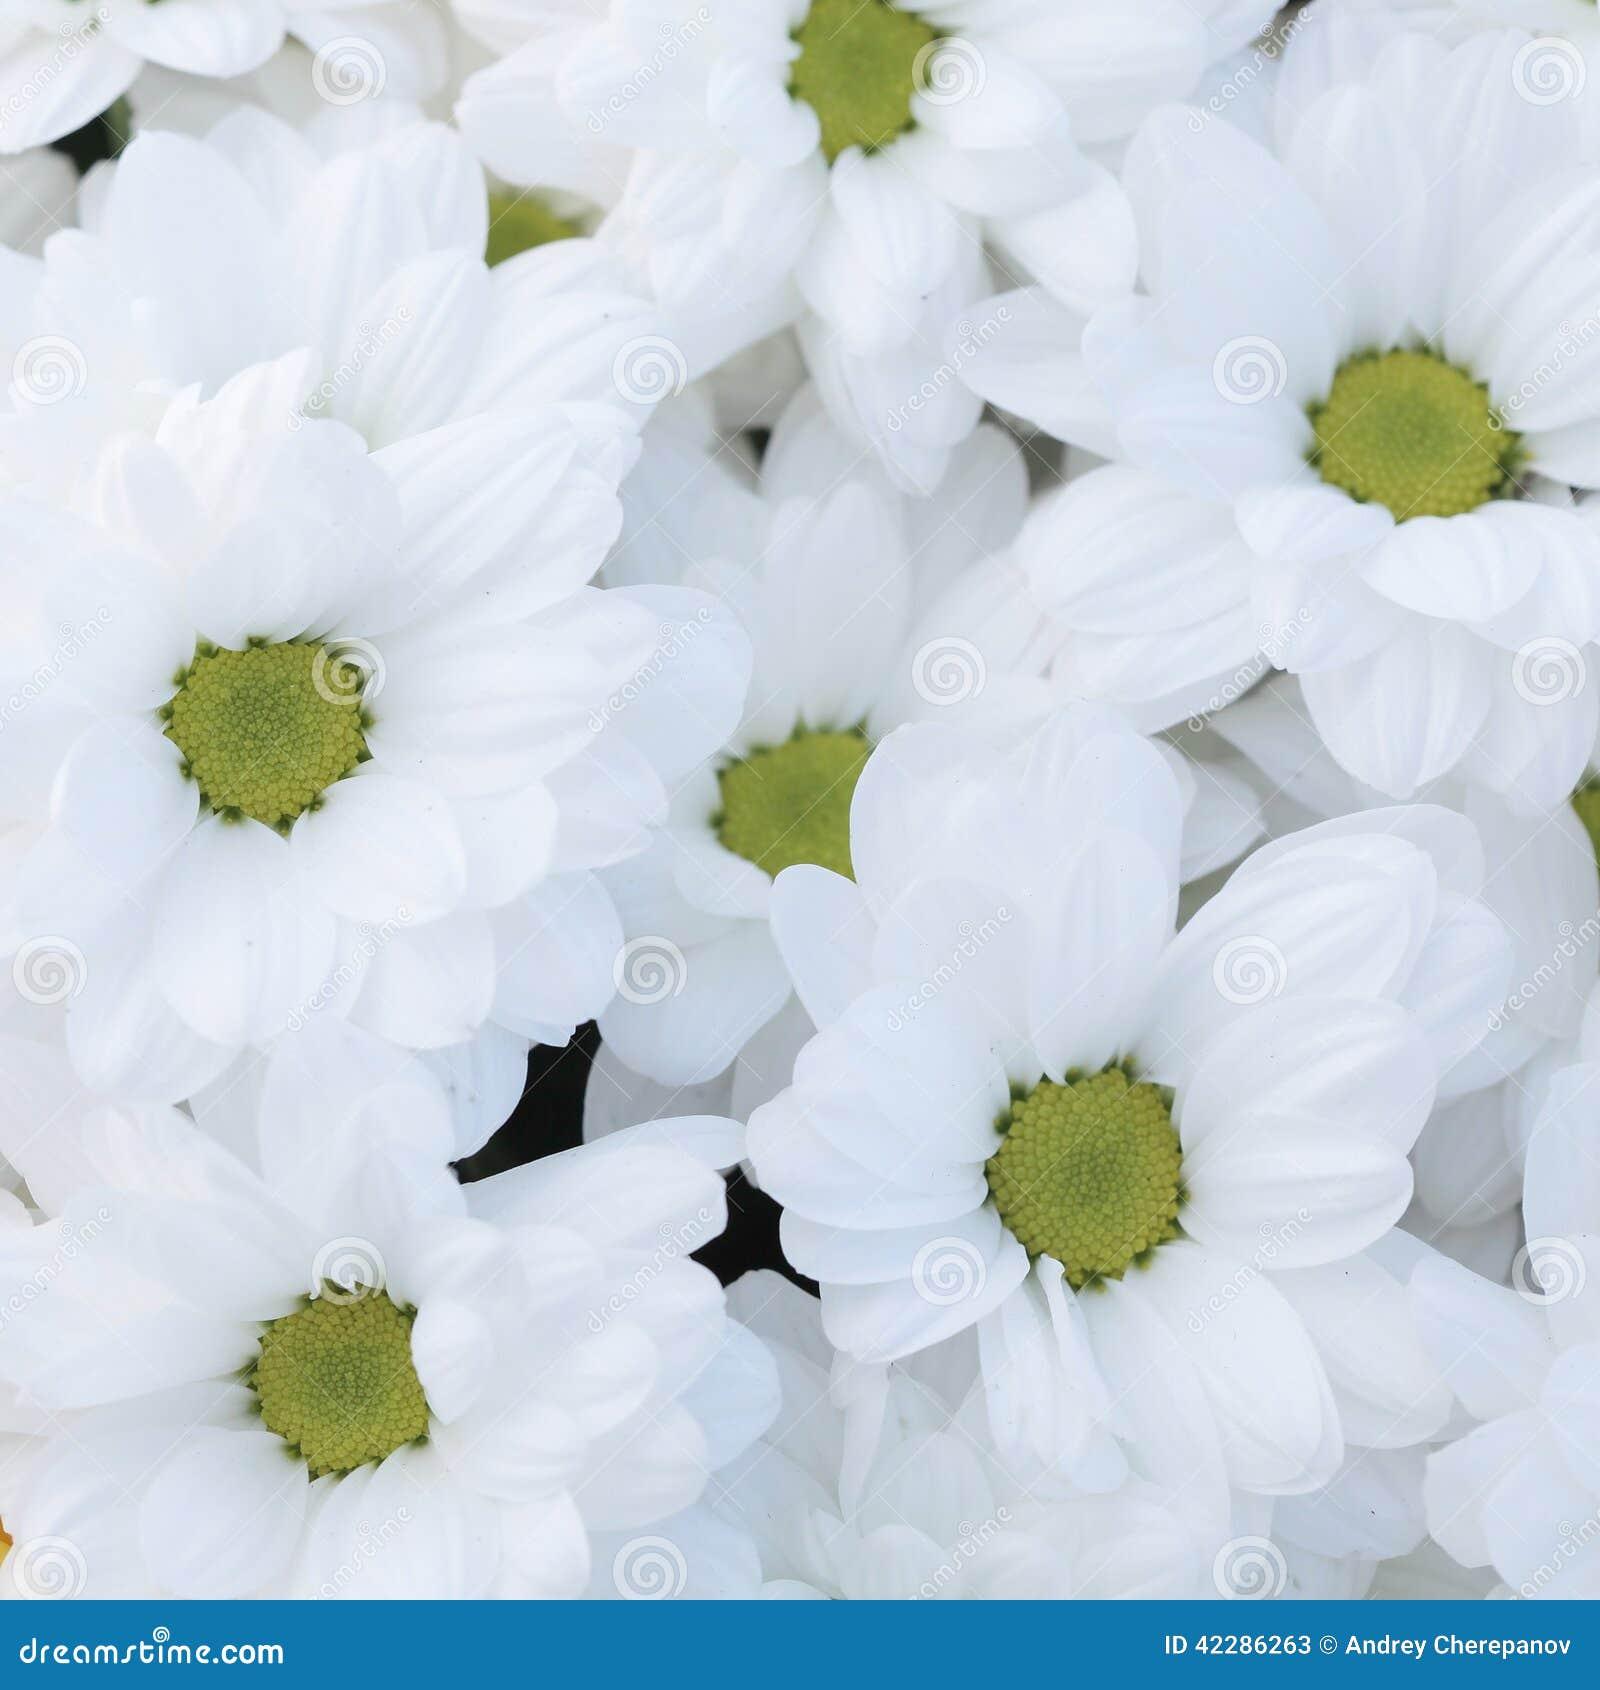 Unusual Beautiful Tender White Flowers Background Stock Image